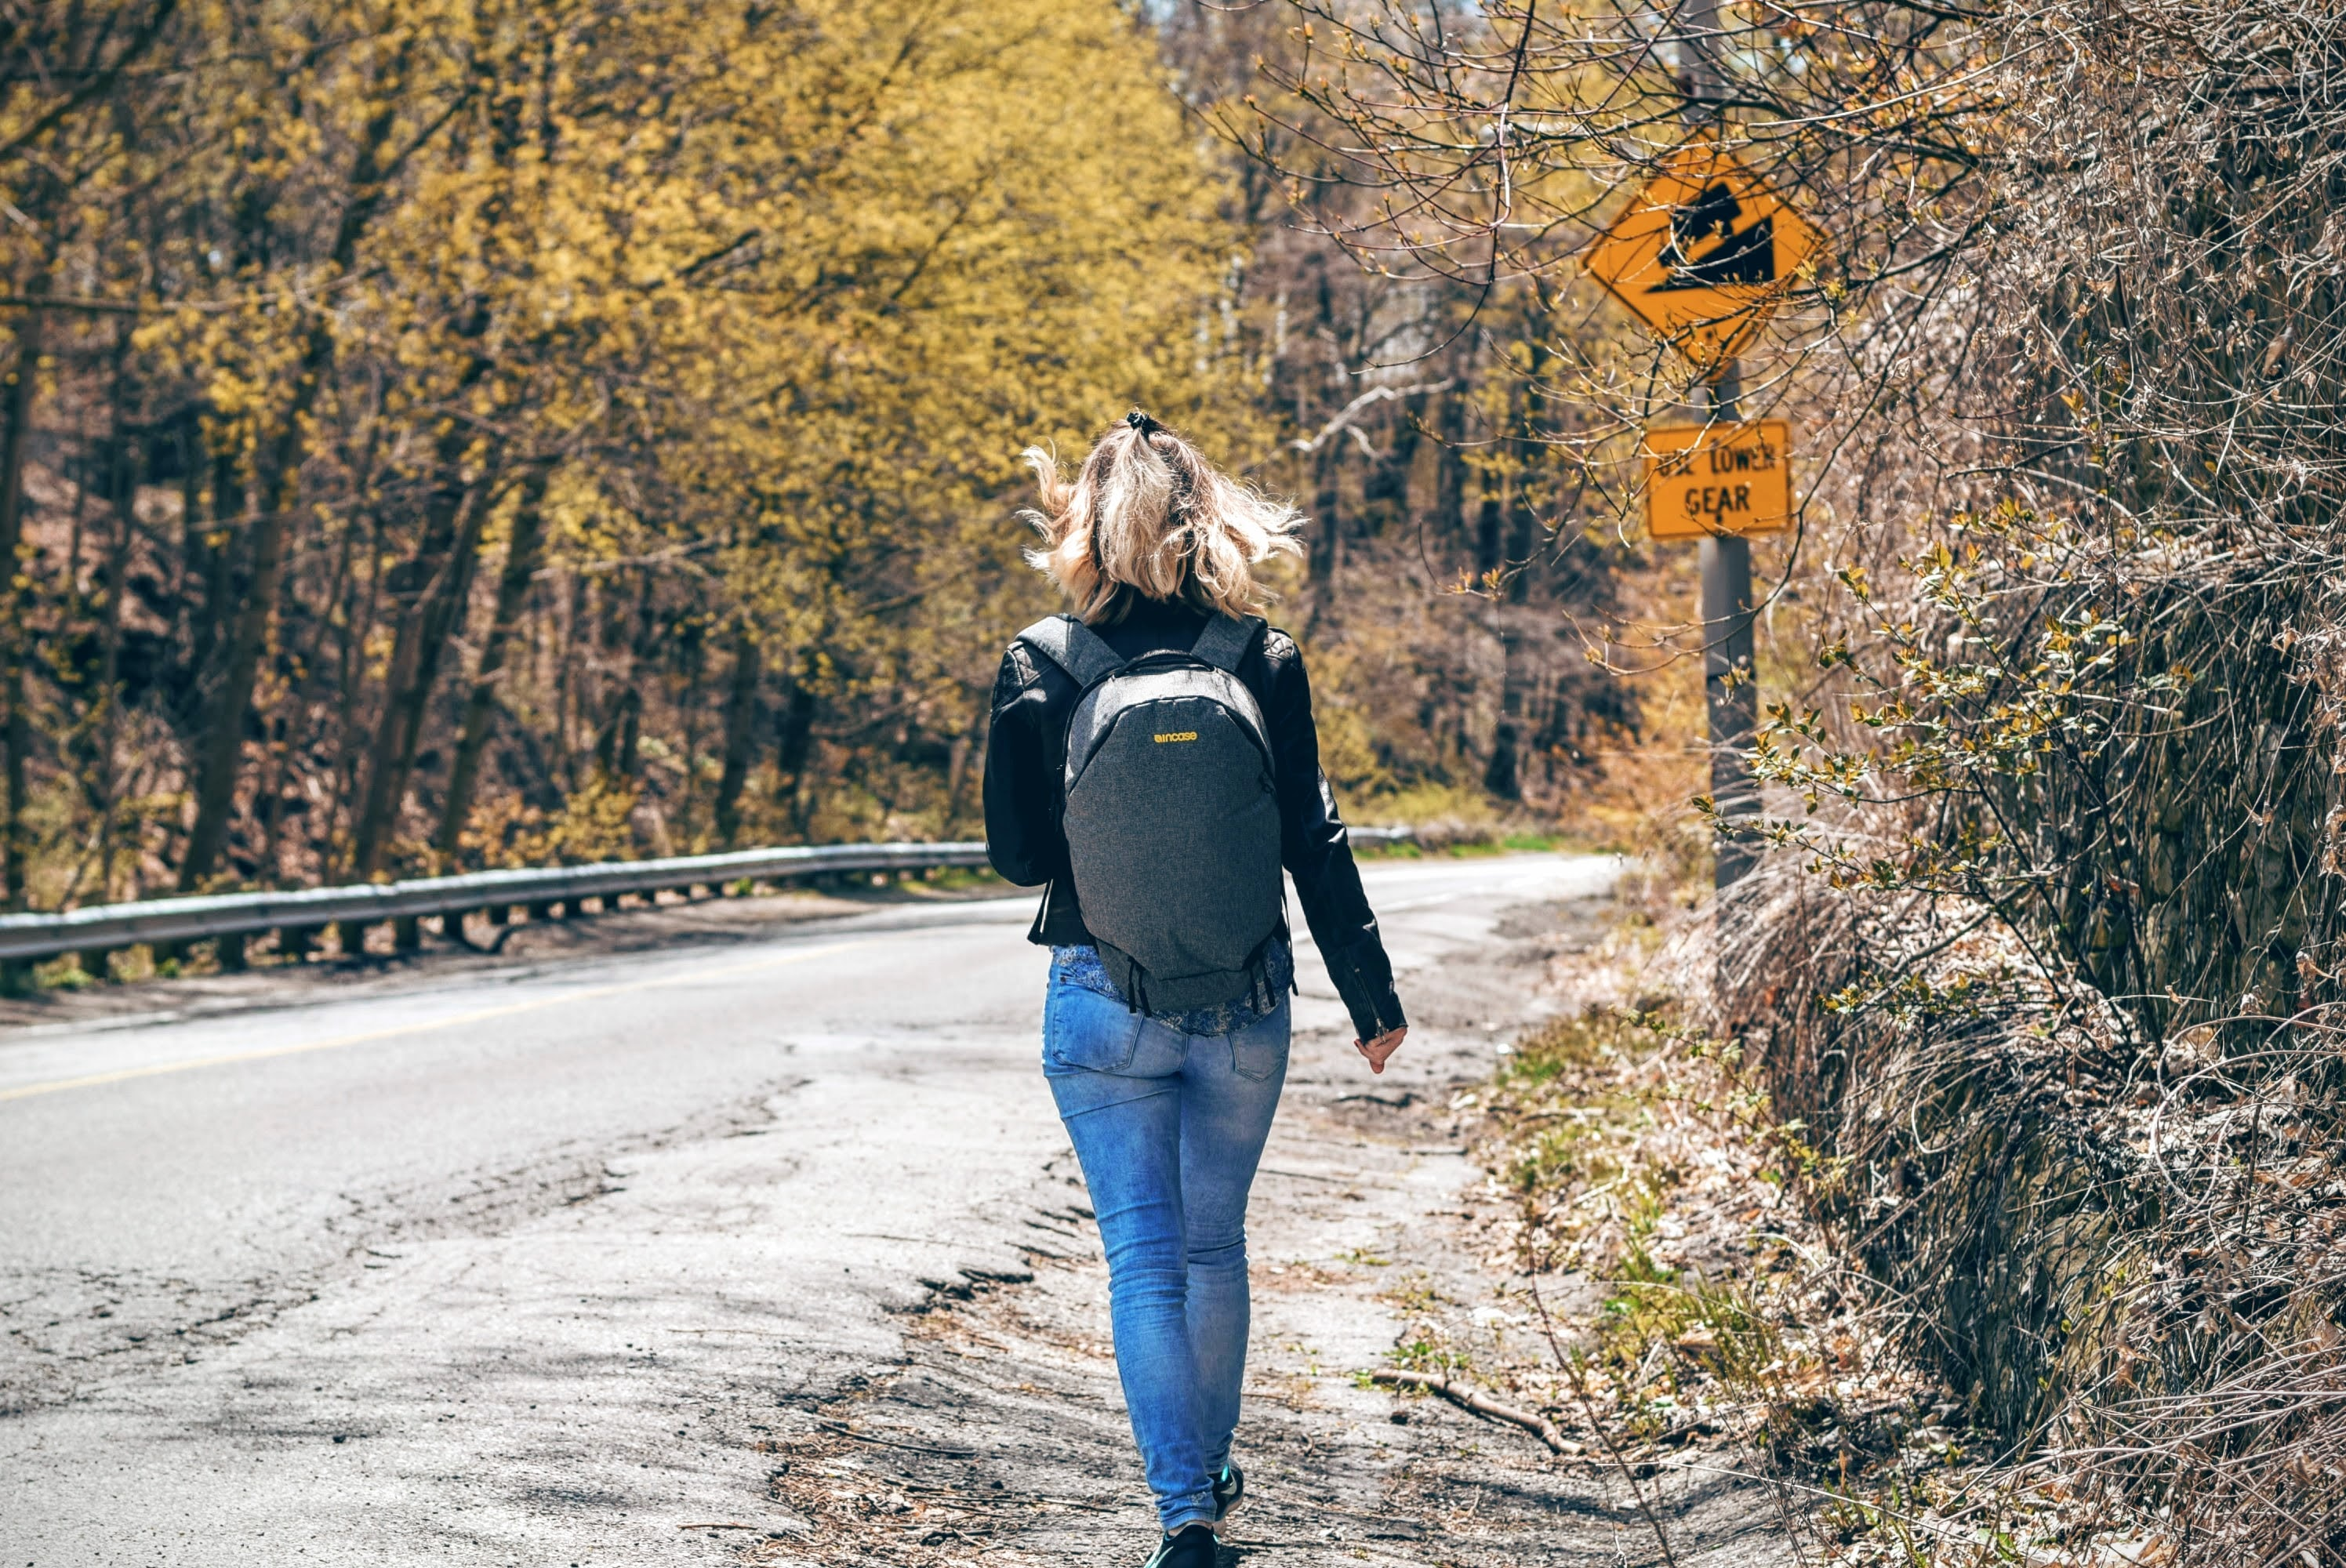 Woman walks along a windy rural road wearing a backpack